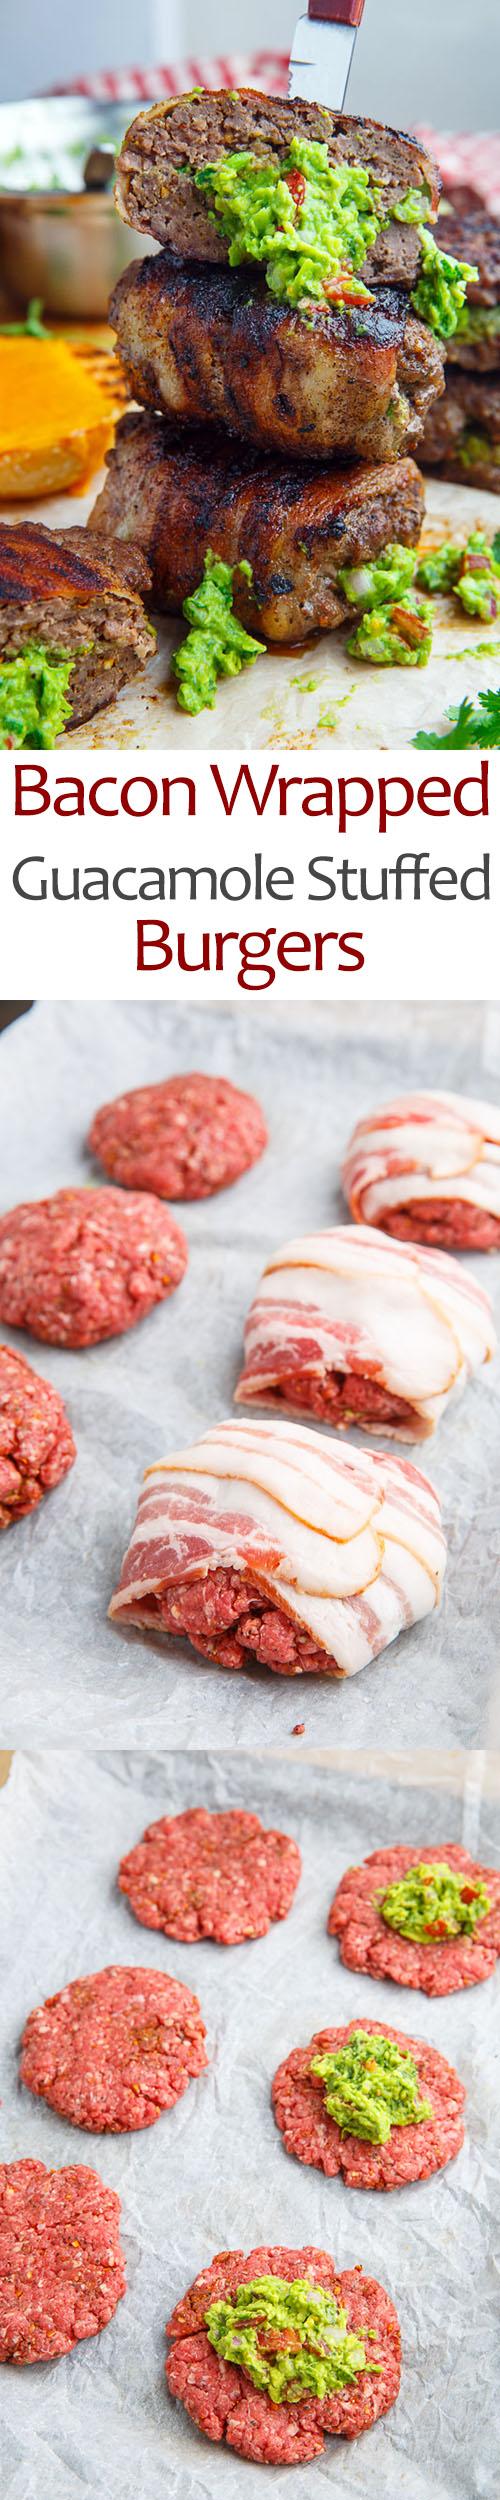 Bacon Wrapped Guacamole Stuffed Burgers